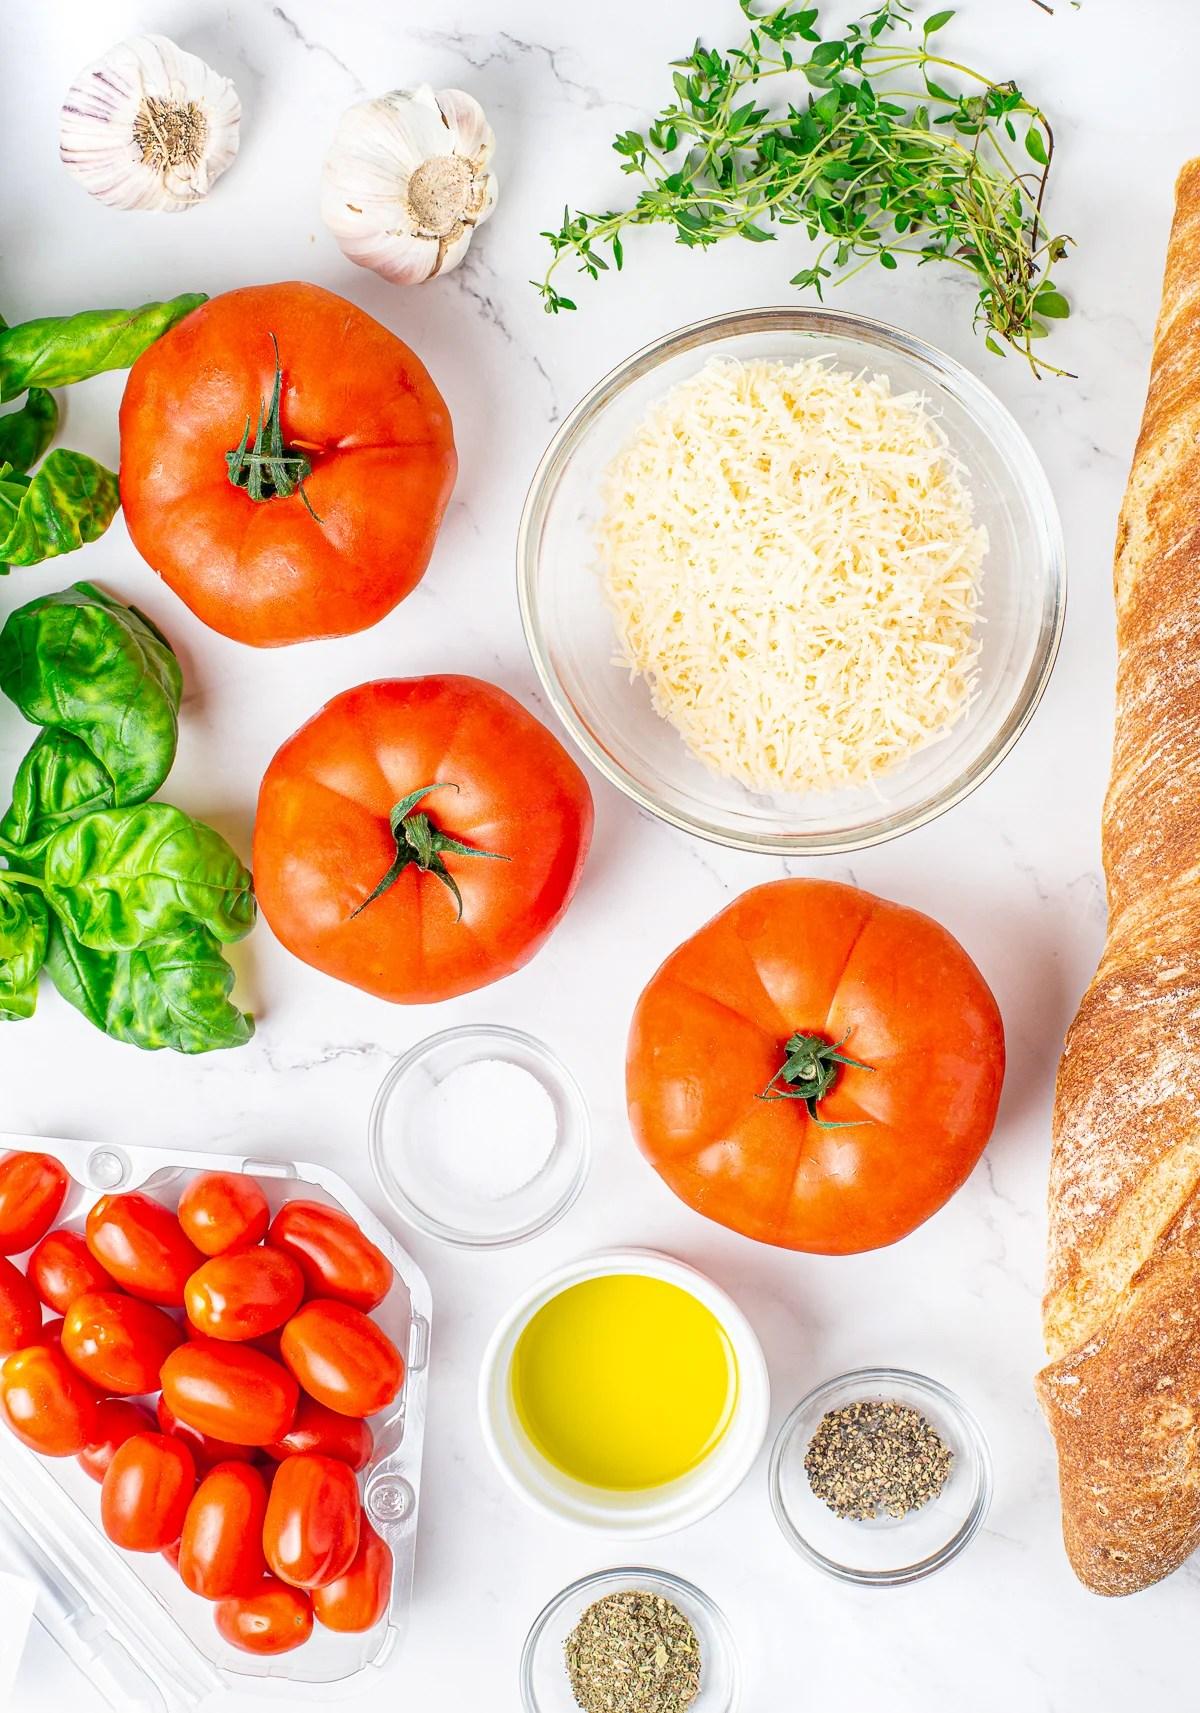 Ingredients needed to make Bruschetta with Garlic Crostini